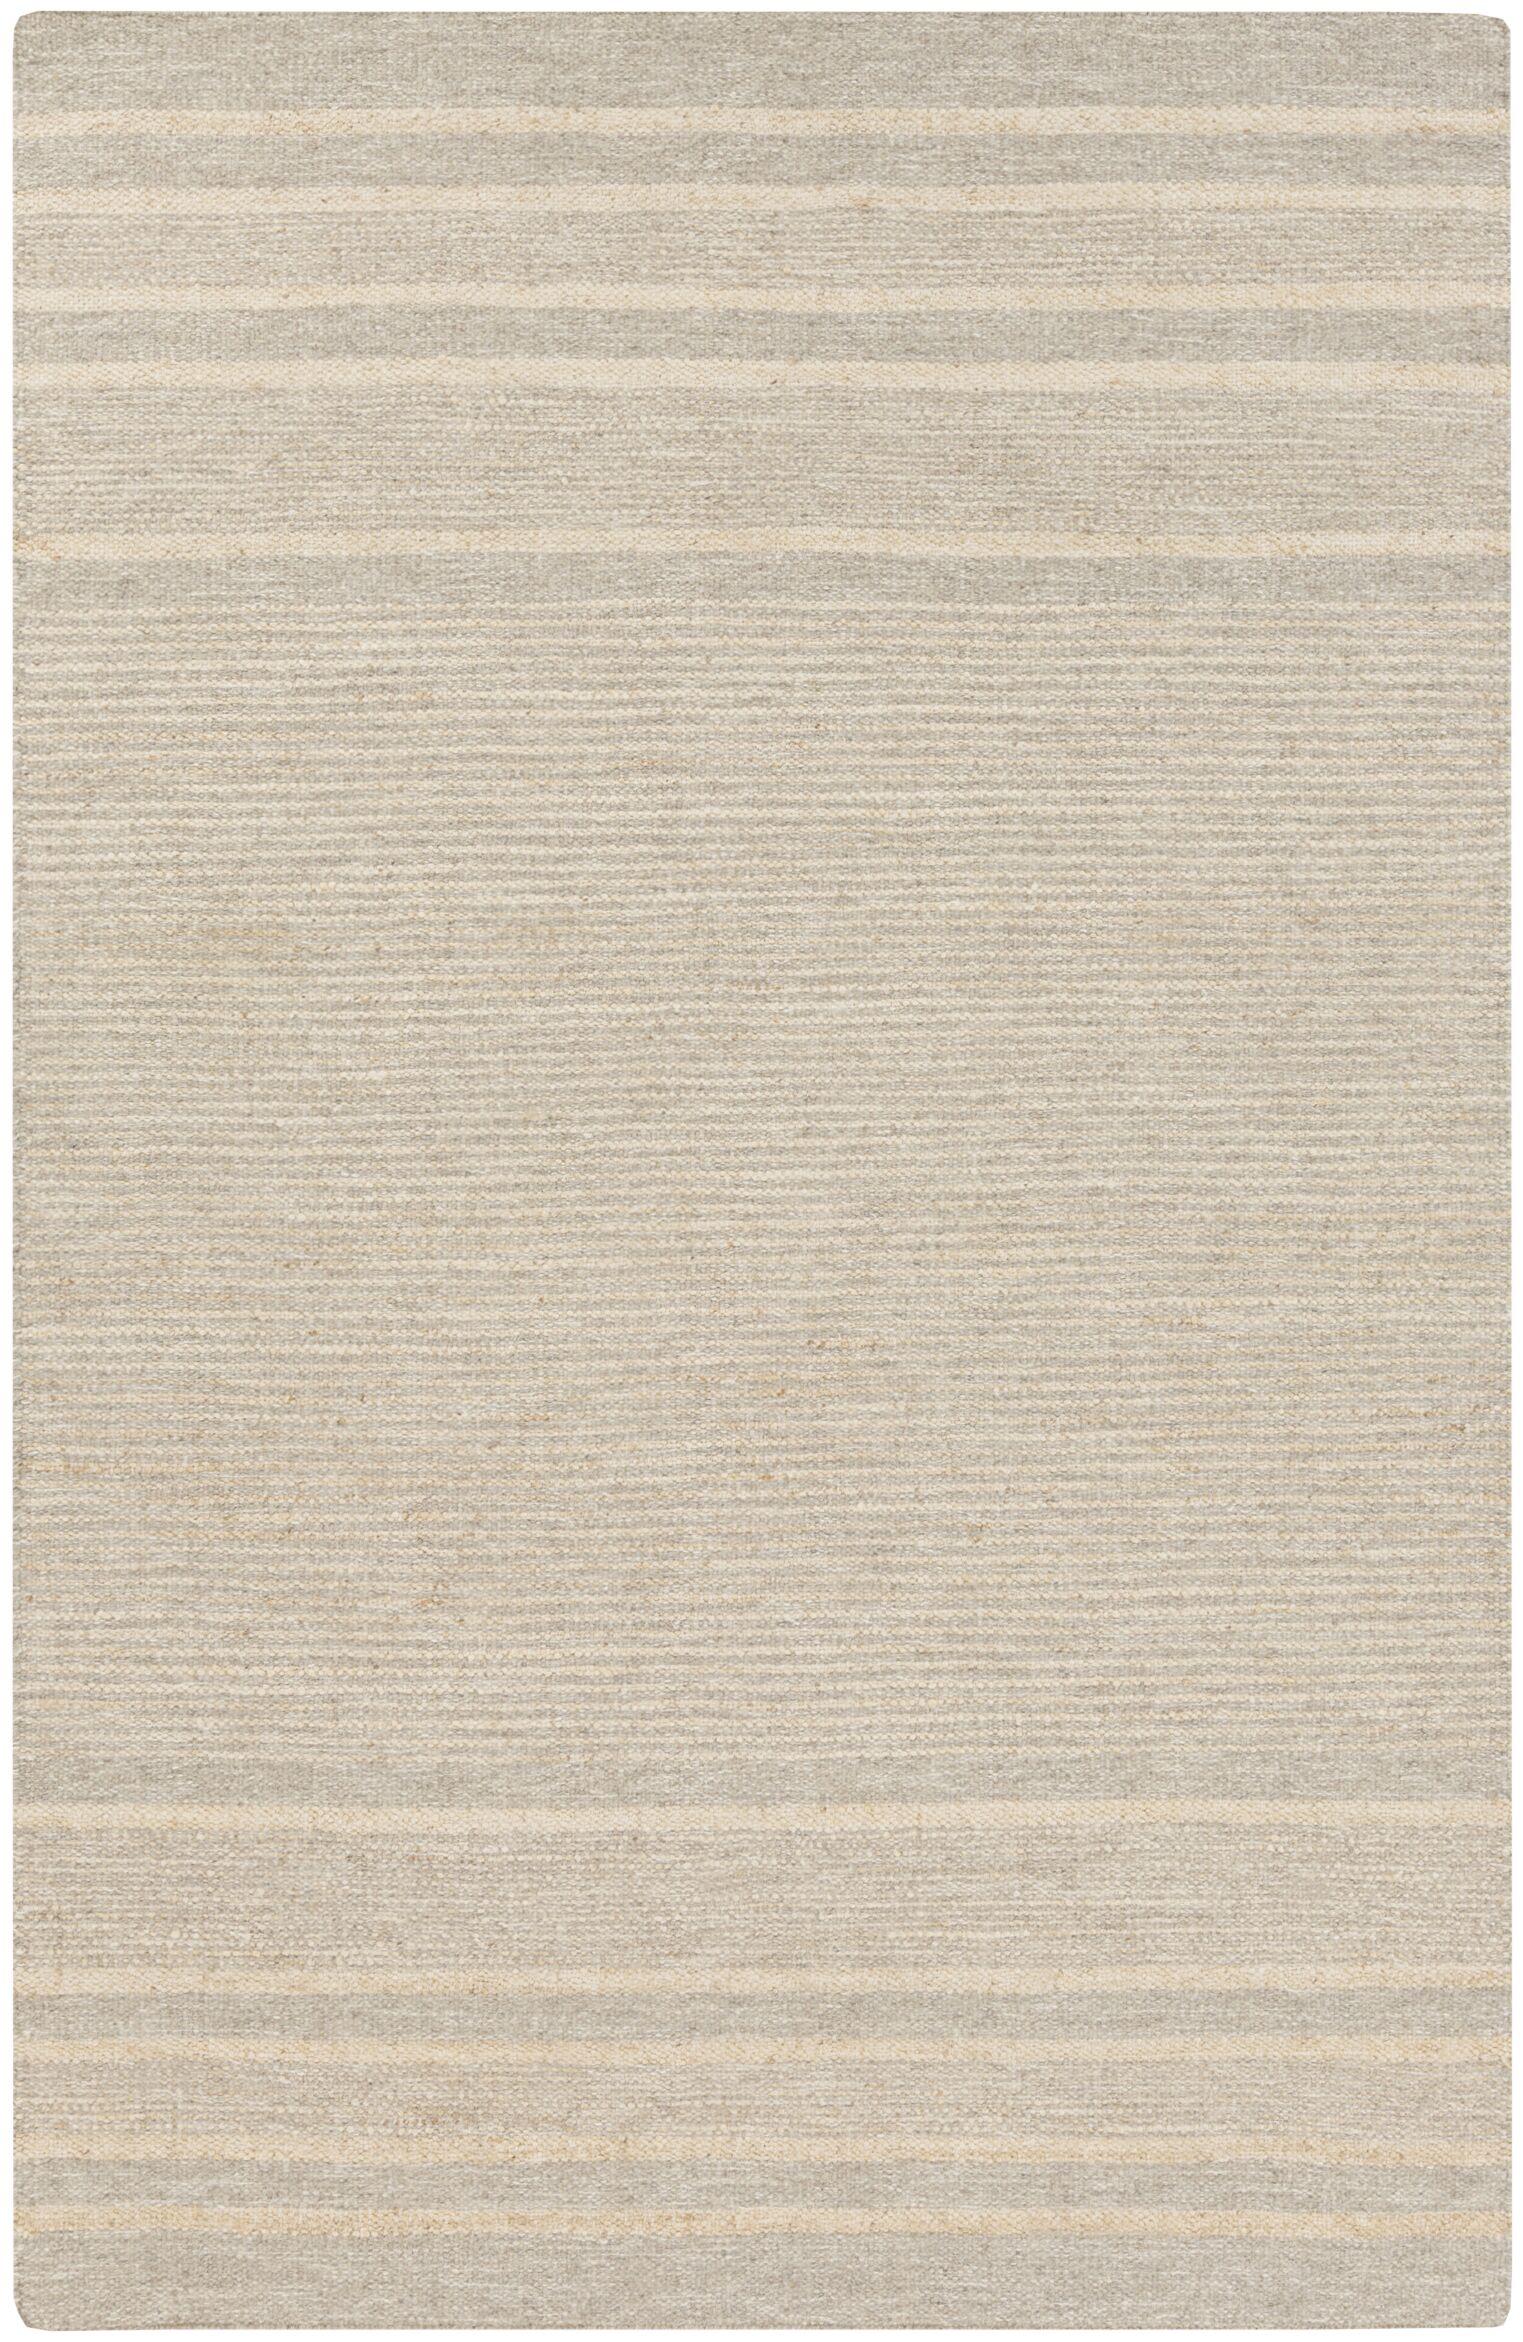 Brewington Butter/Gray Area Rug Rug Size: Rectangle 5' x 8'